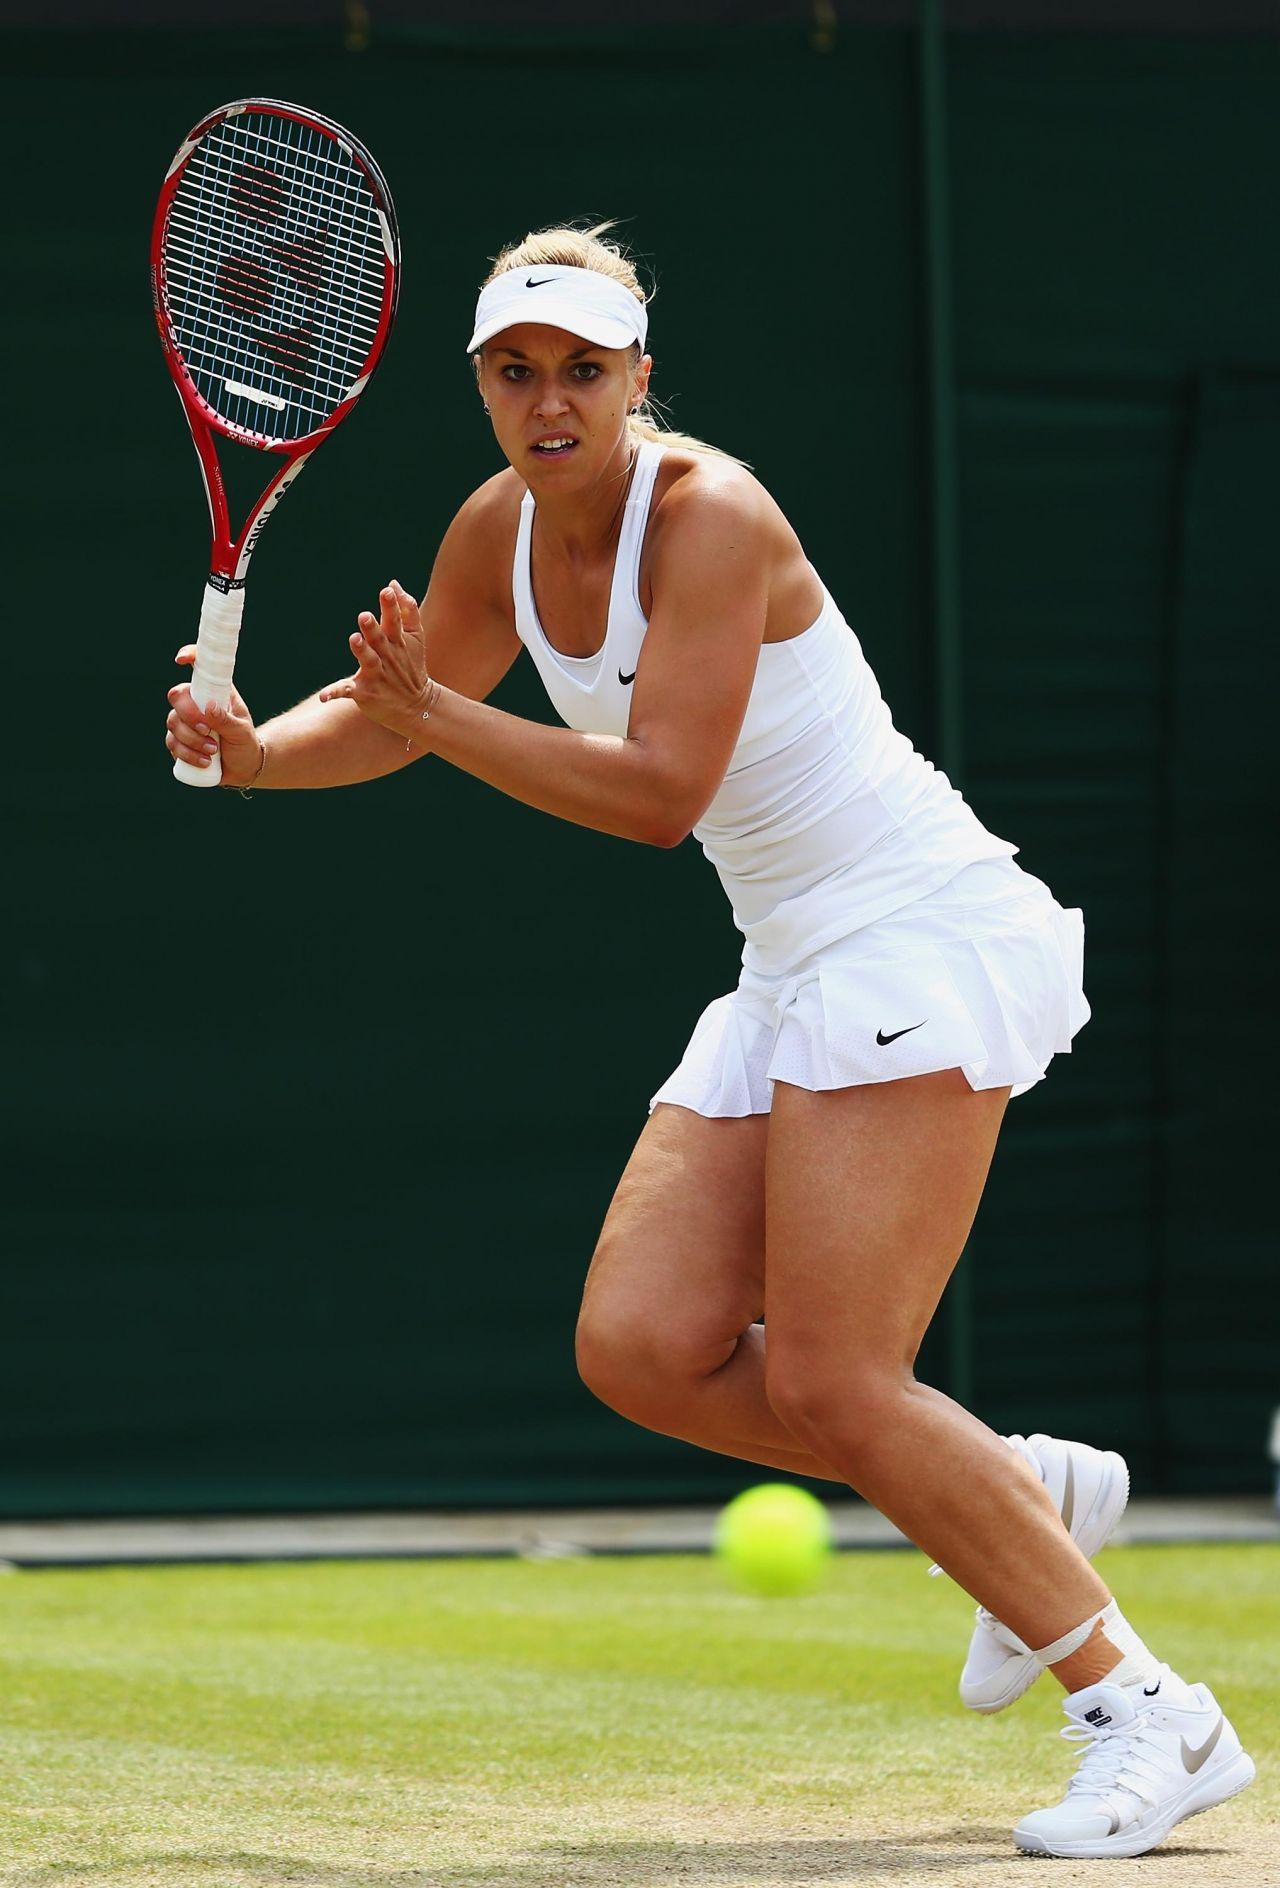 Sabine Lisicki – Wimbledon Tennis Championships 2014 – 4th Round